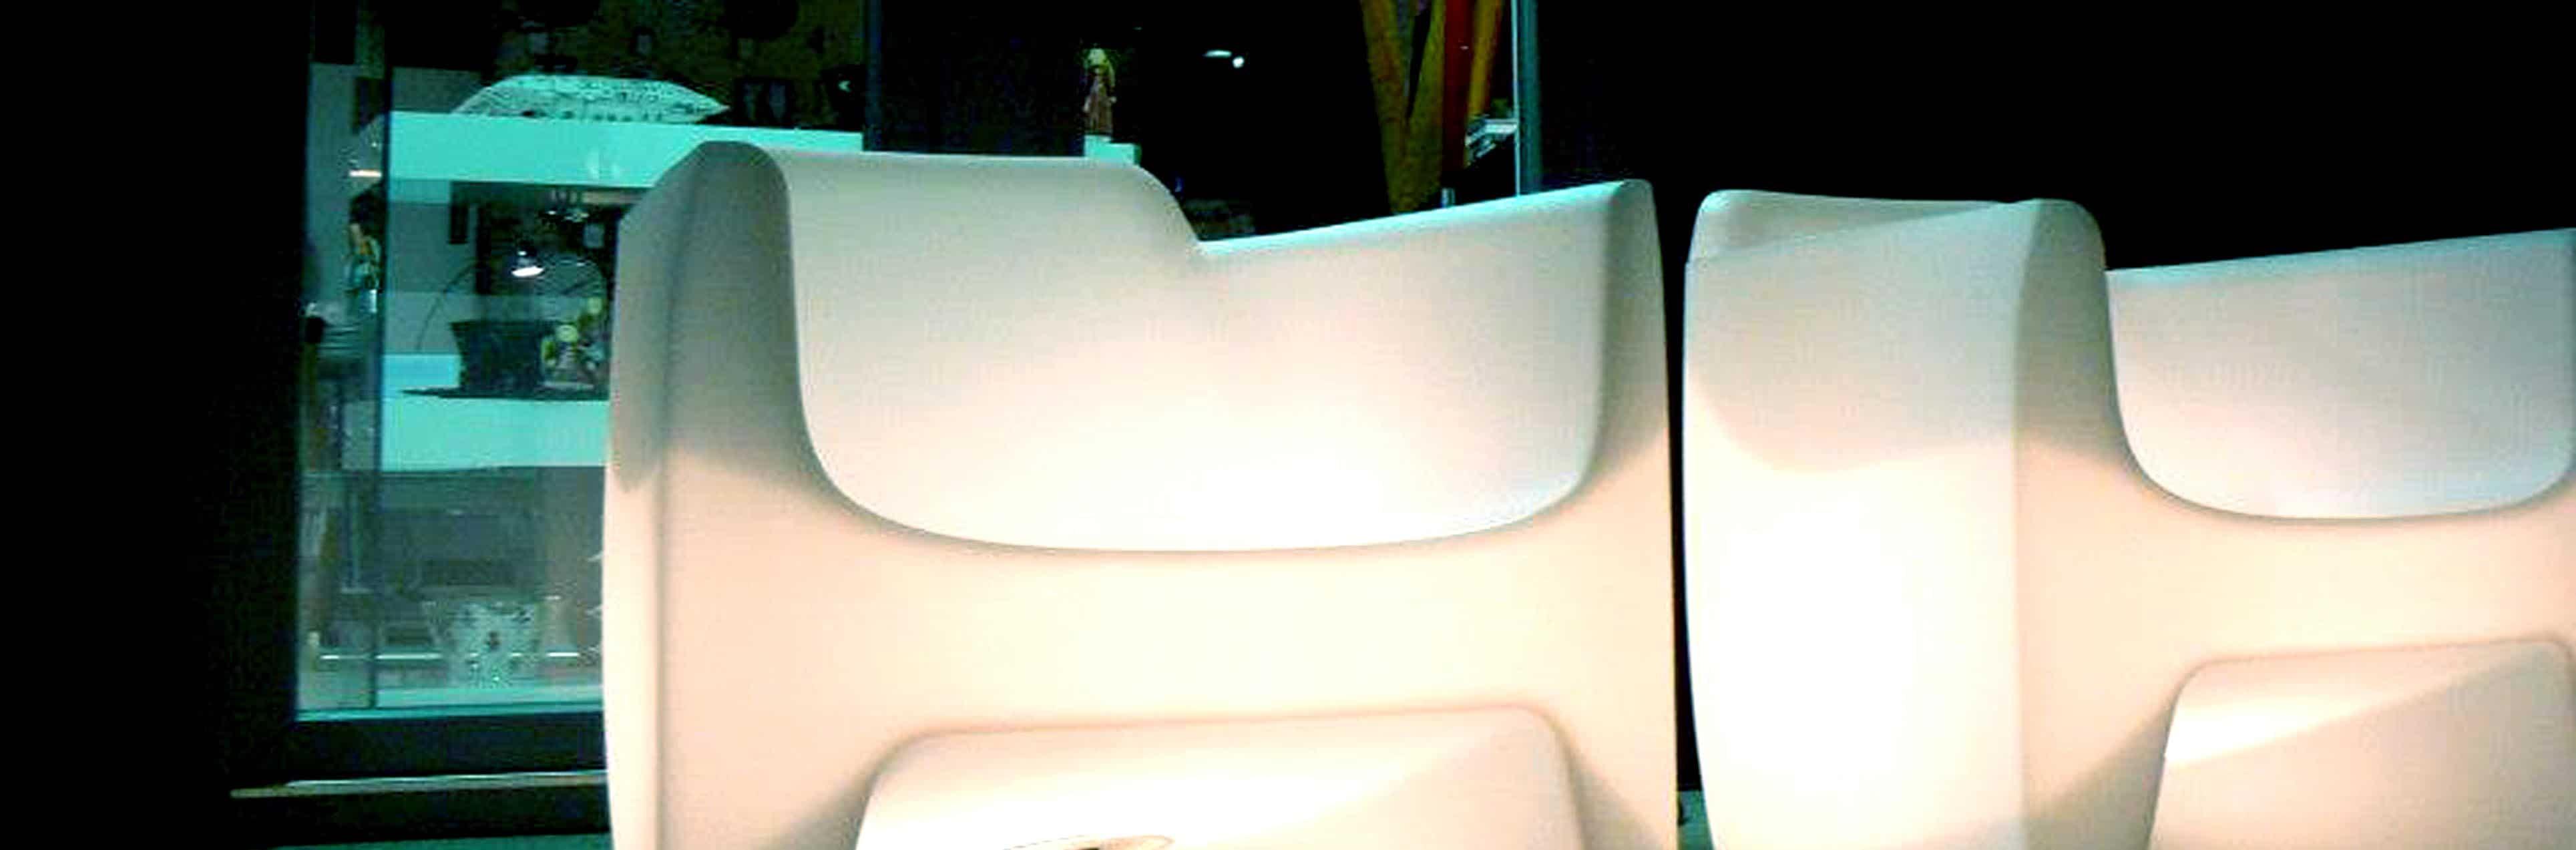 qui-est-paul-translation-armchair-light